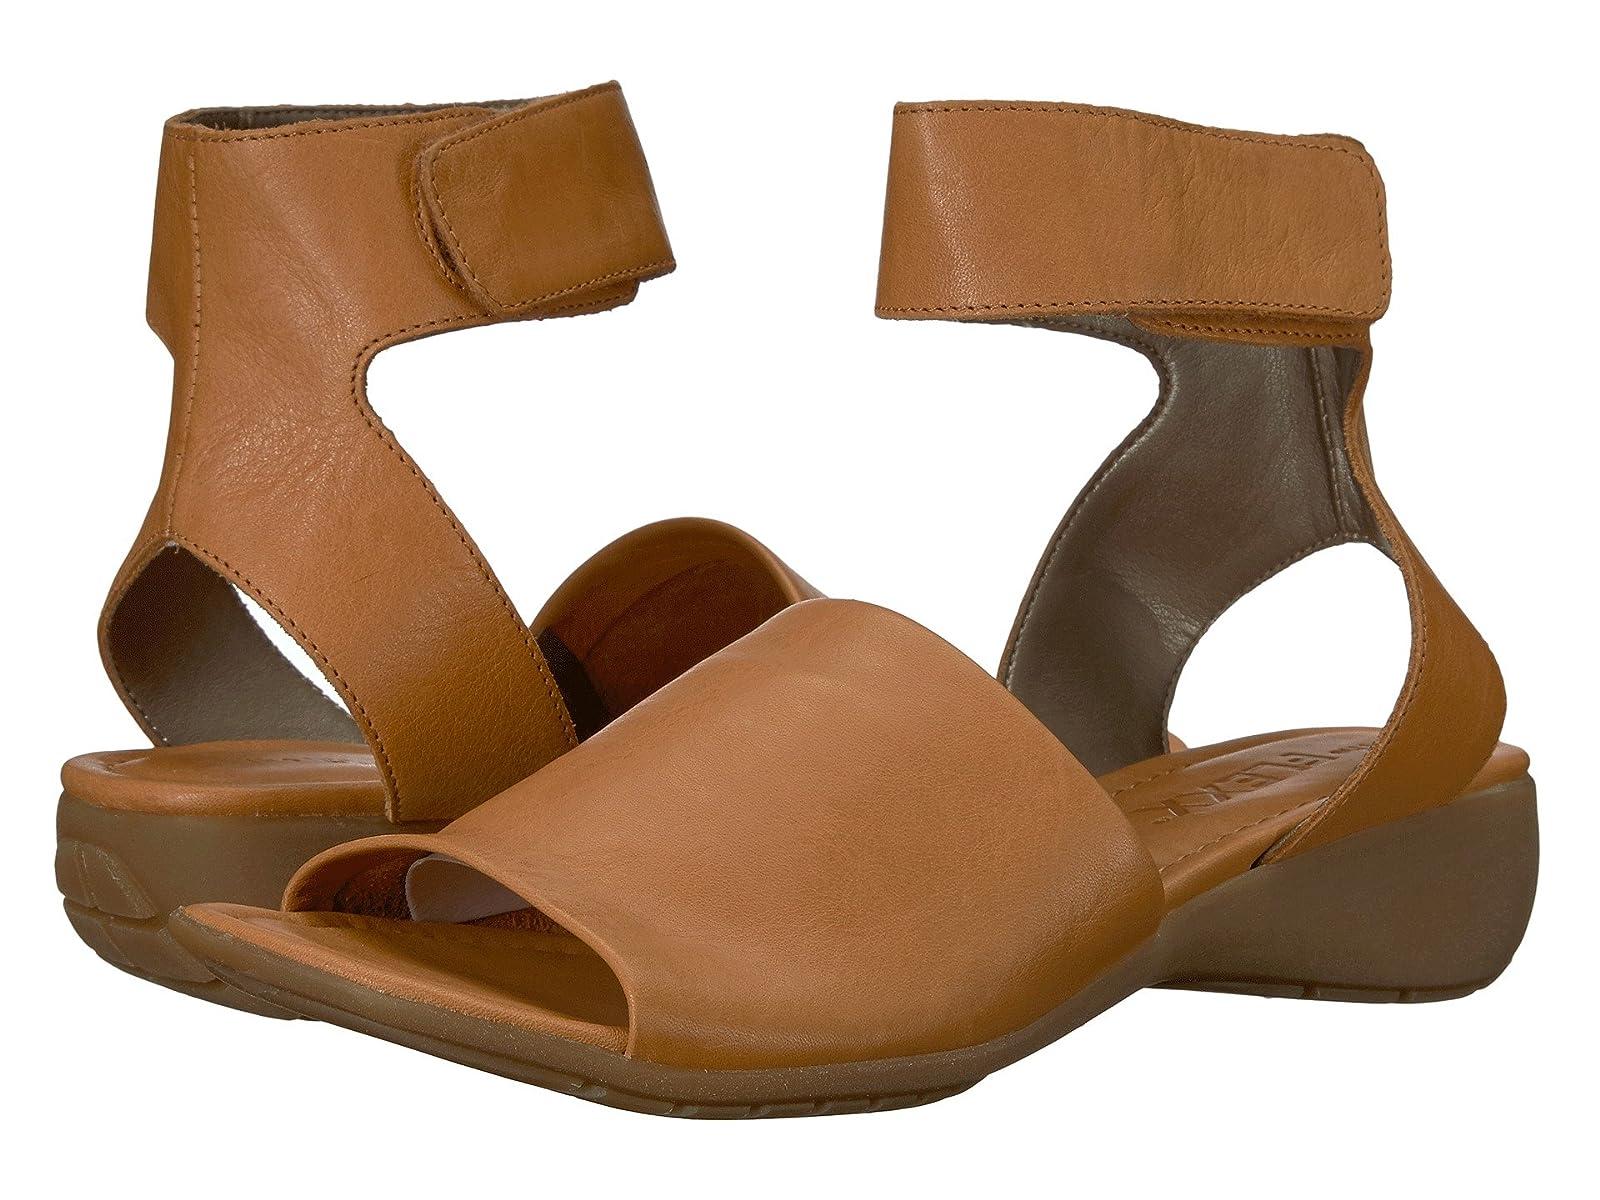 The FLEXX BegladAtmospheric grades have affordable shoes